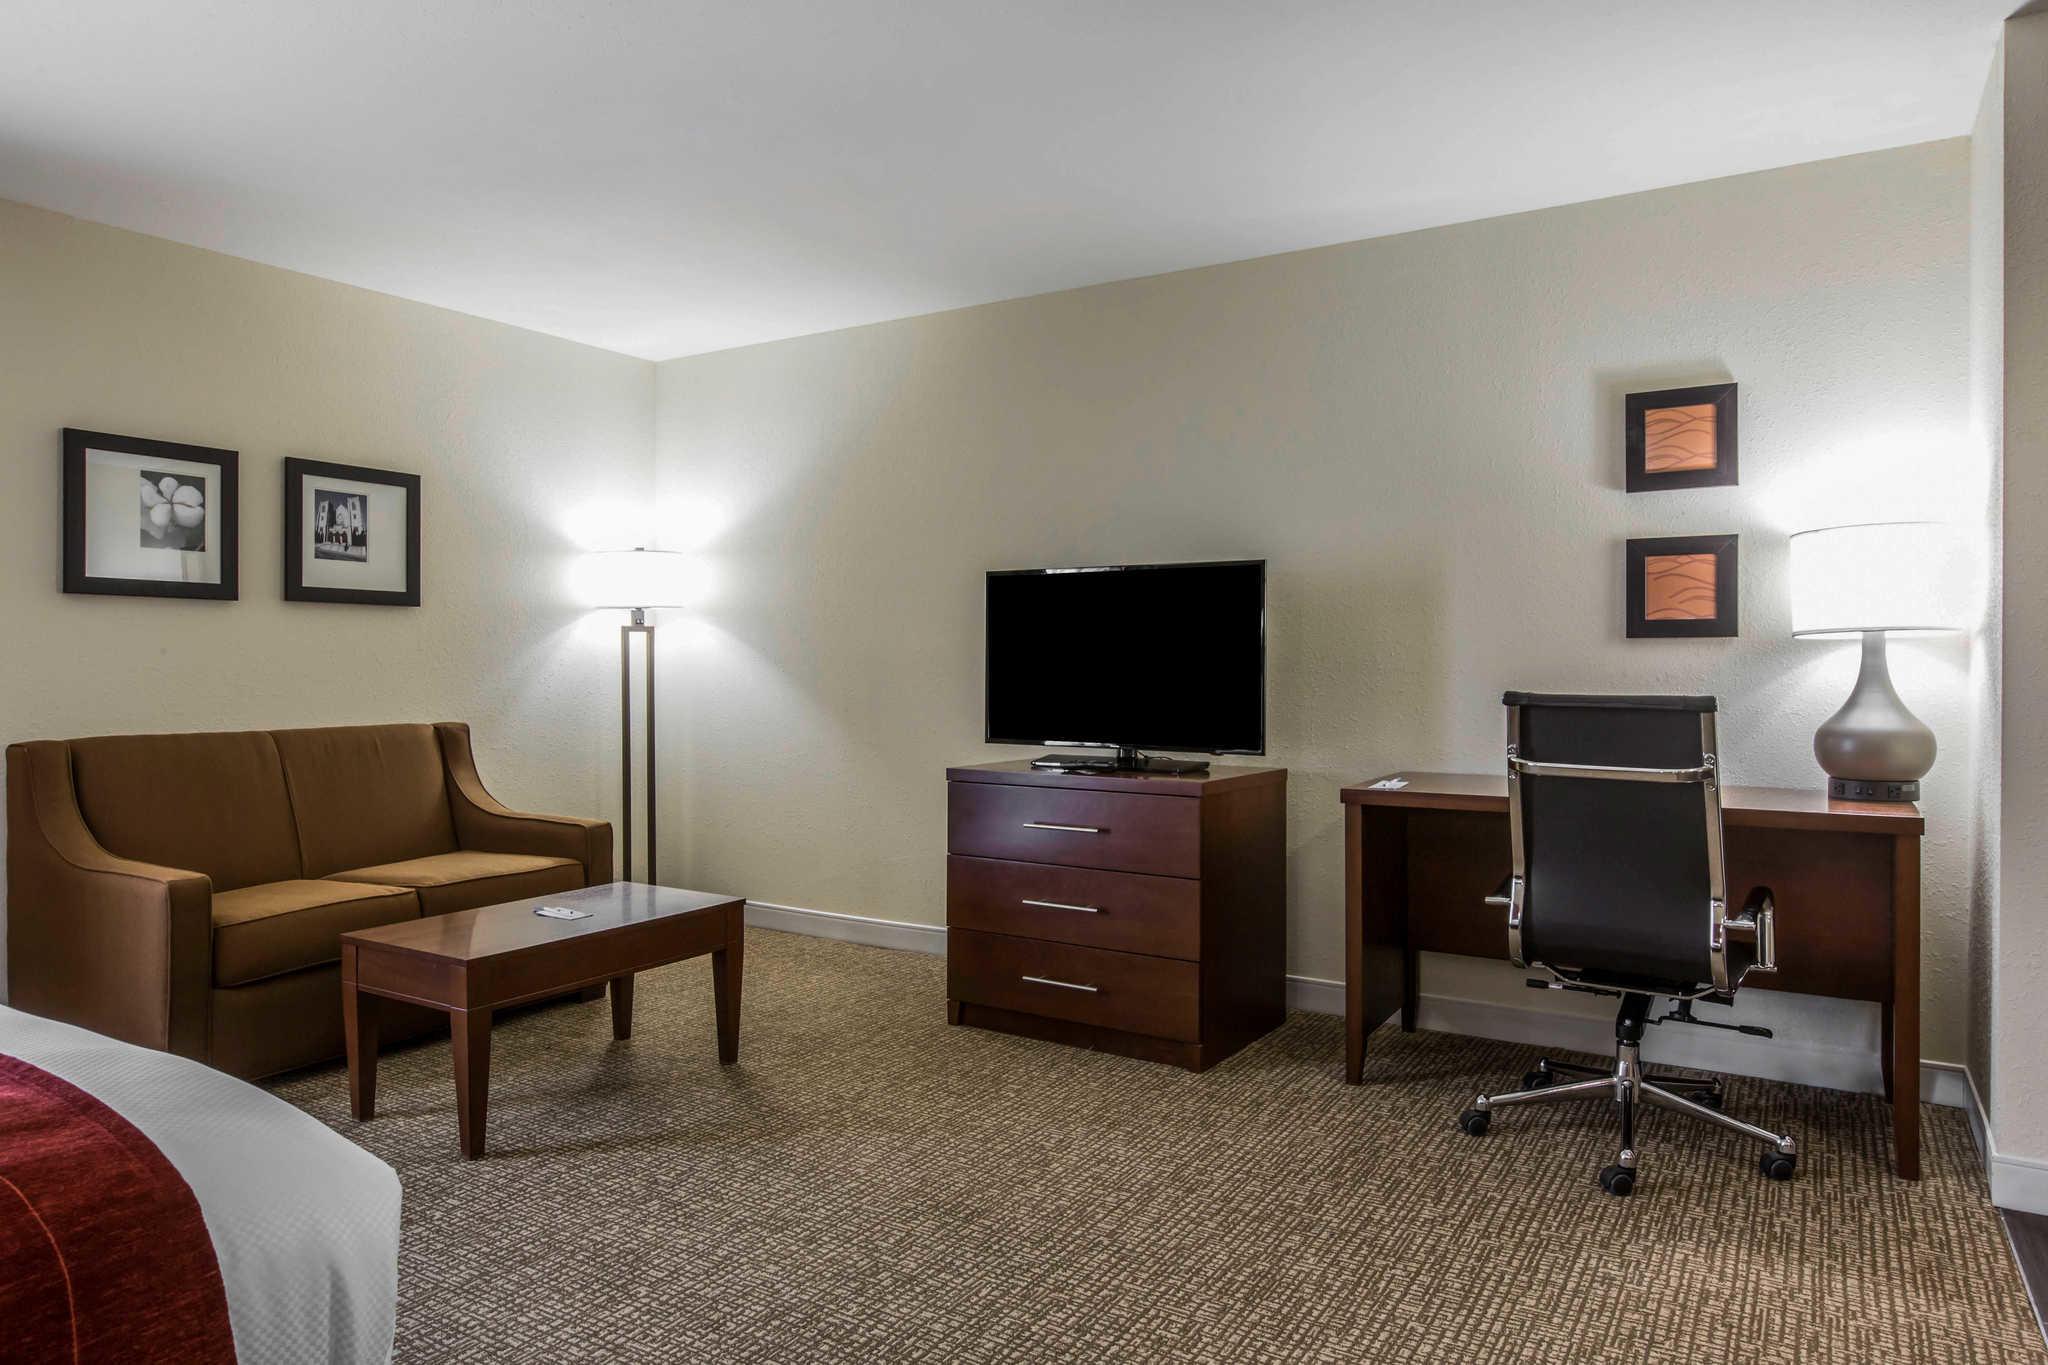 Comfort Inn & Suites West image 25